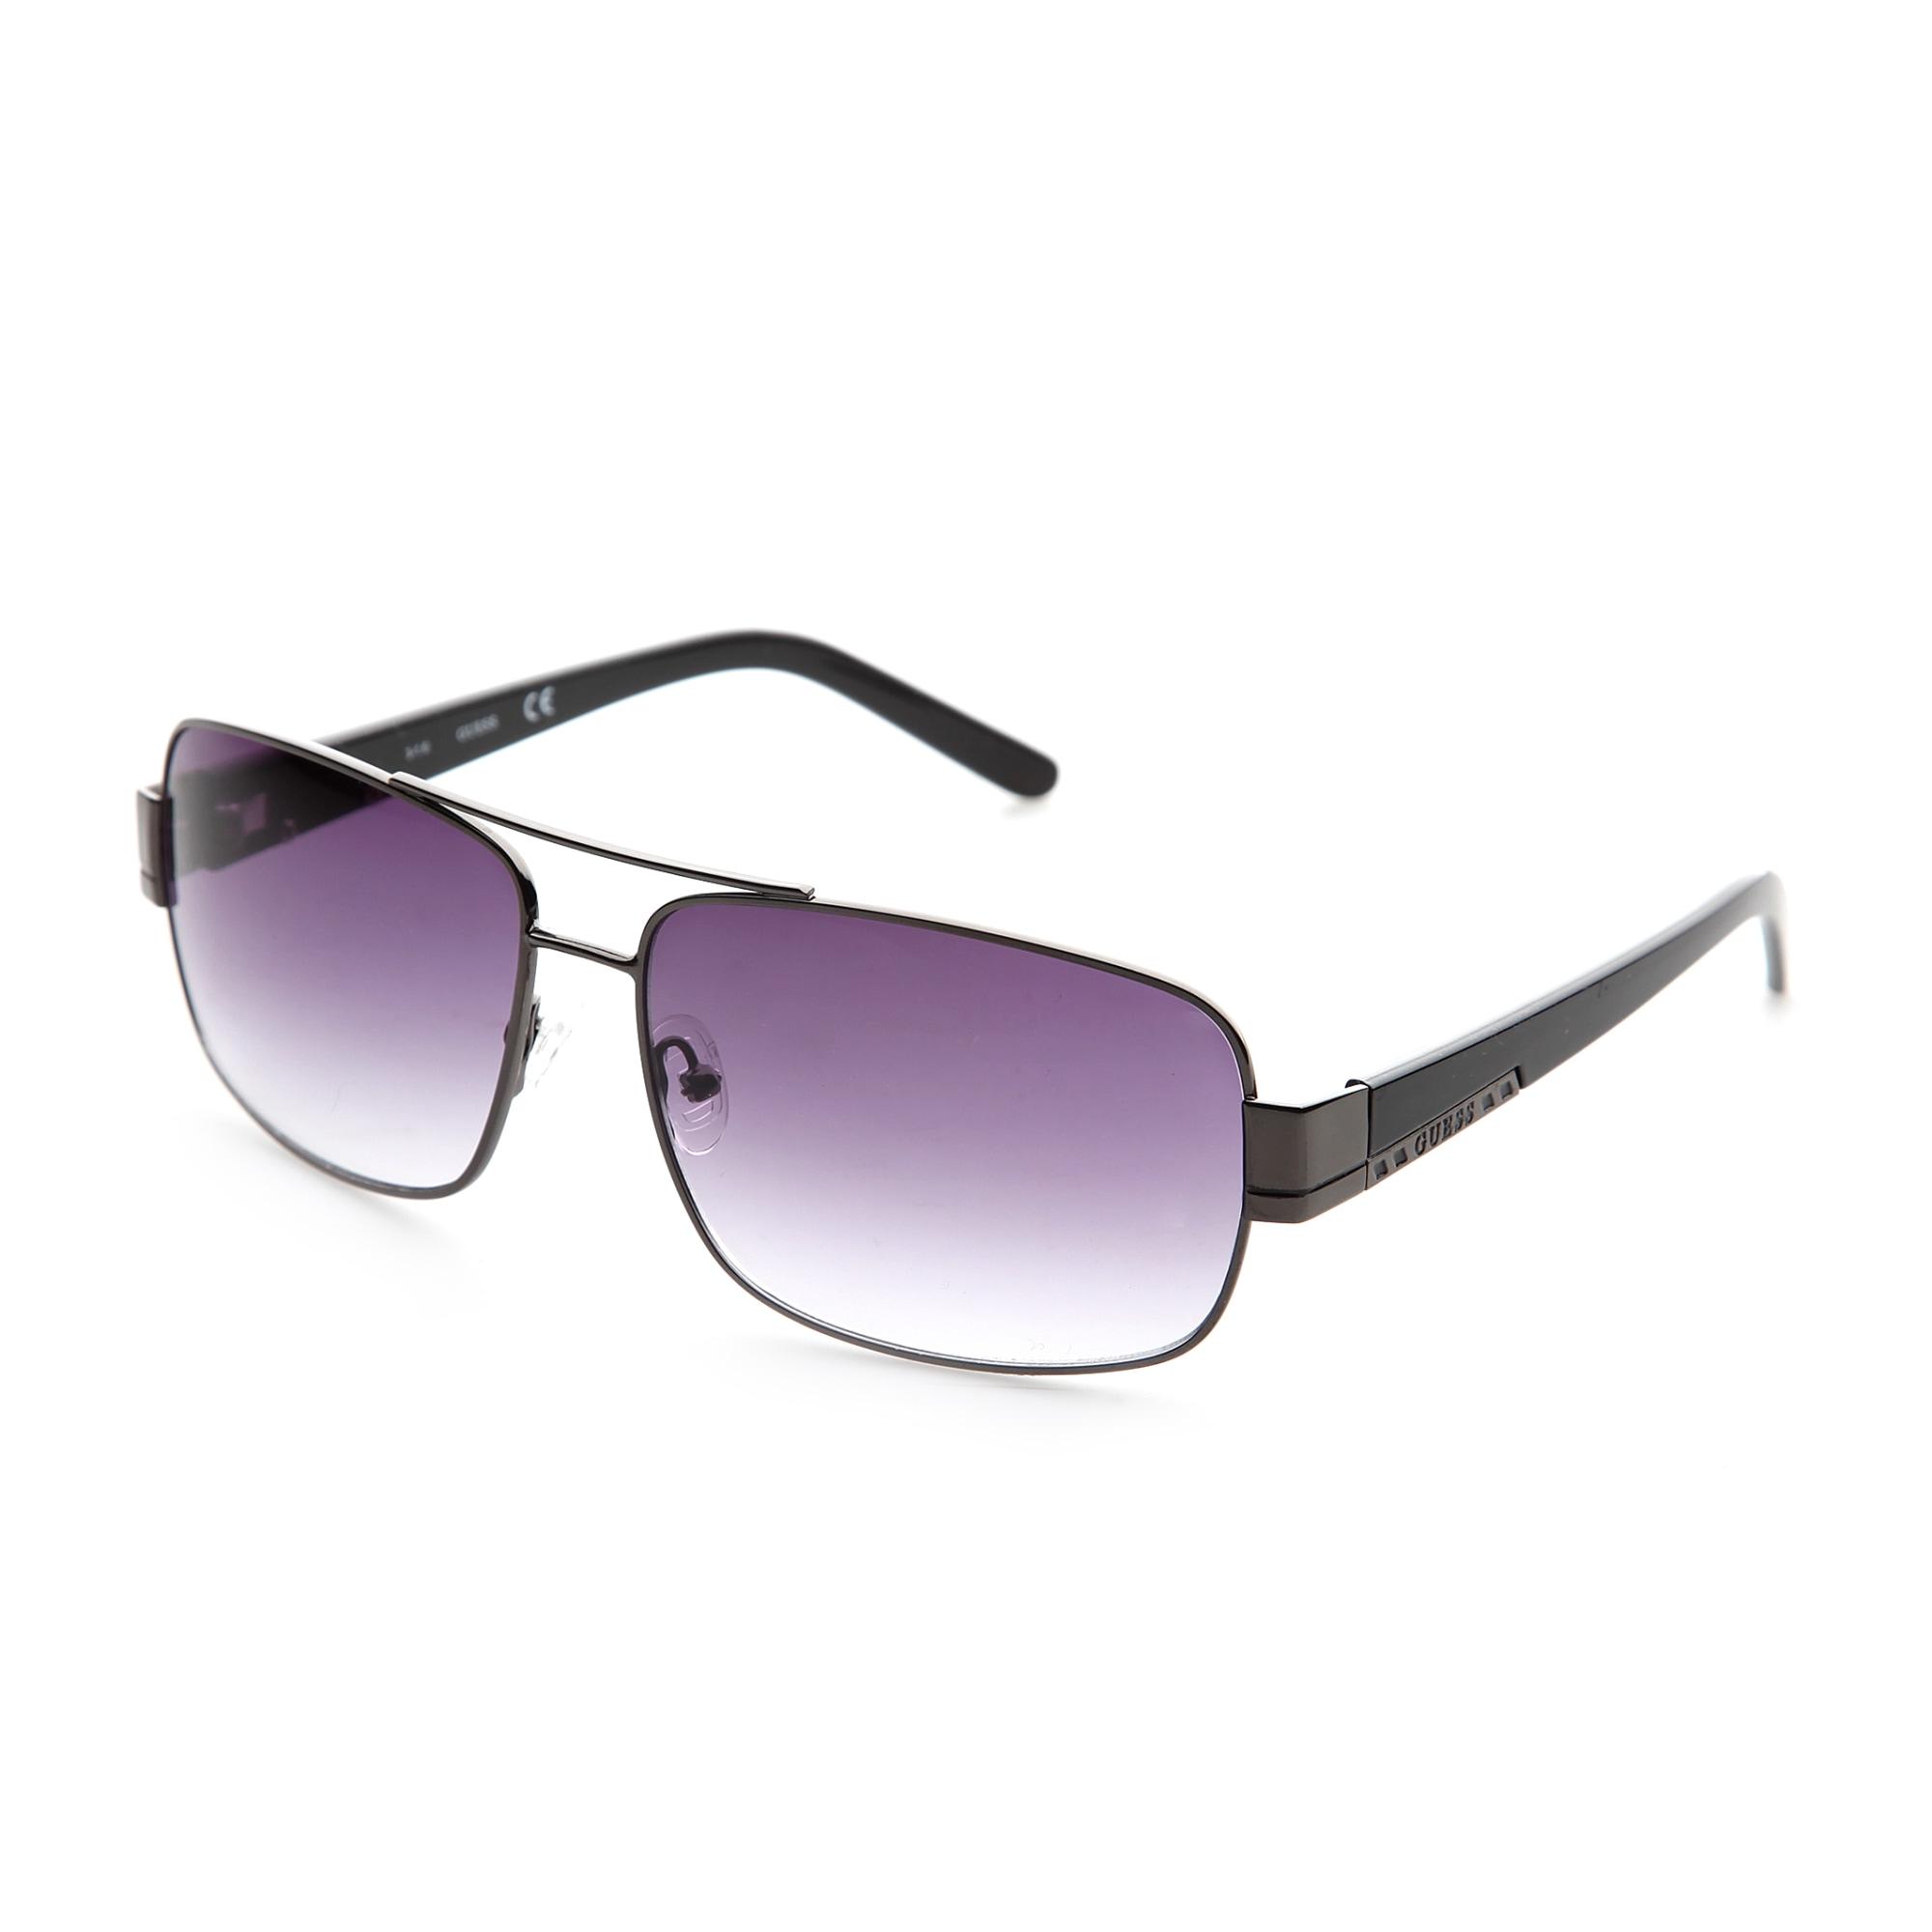 Sunglasses GUESS Gray, charcoal